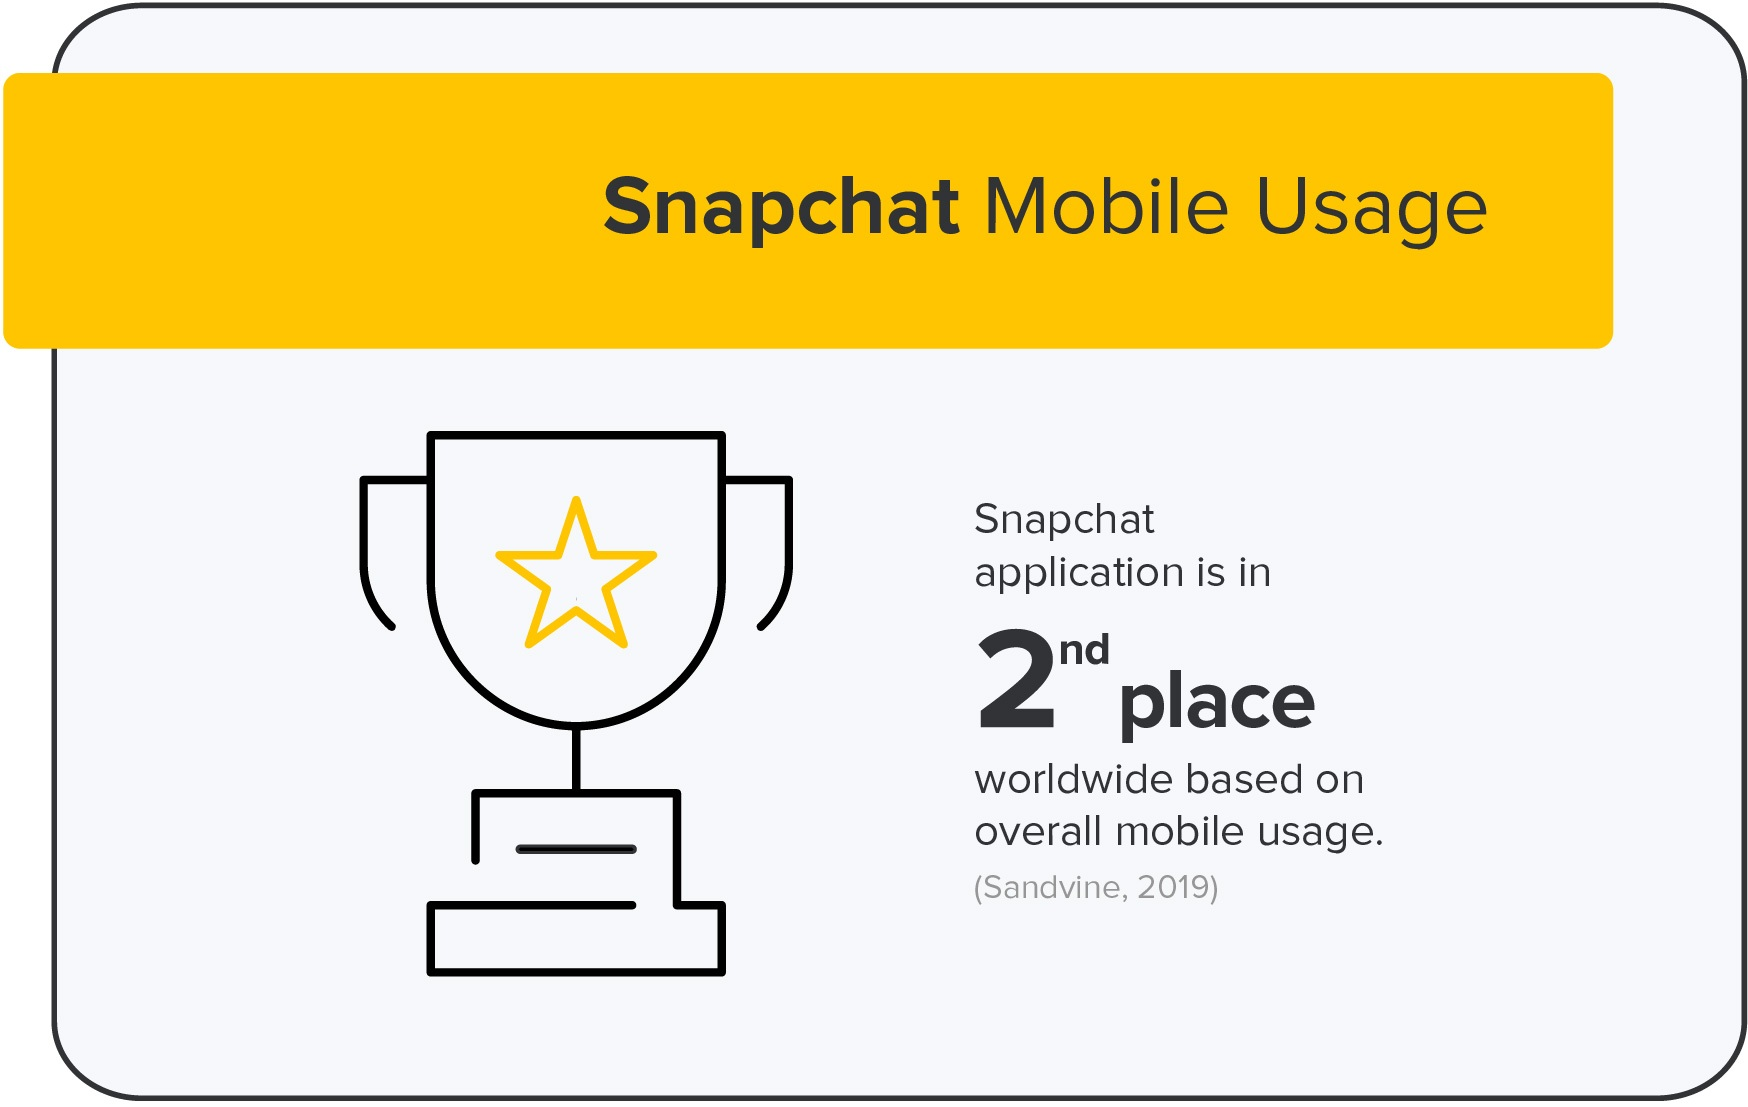 snapchat mobile usage